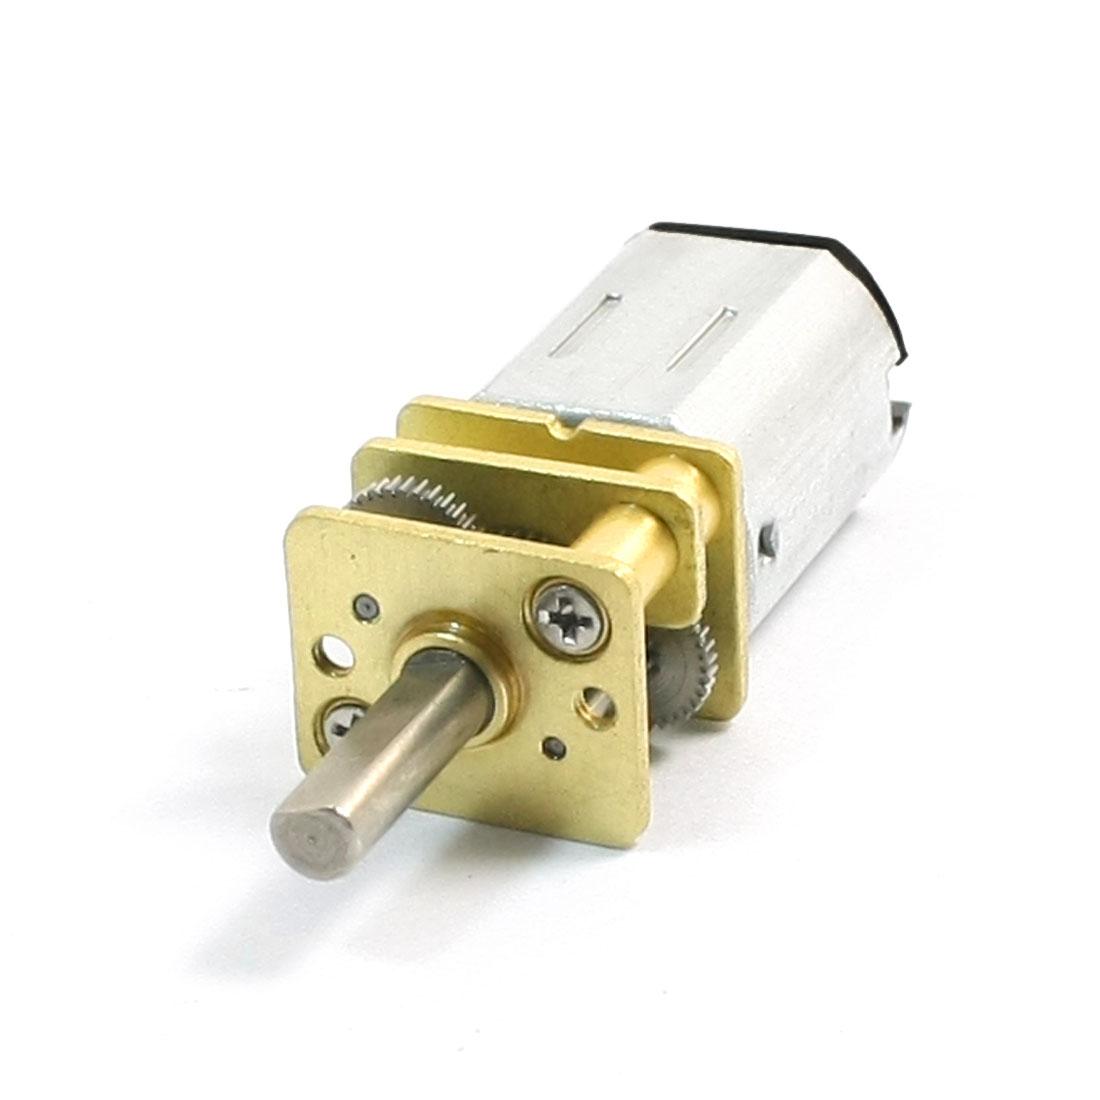 GA12-N20 DC 12V 148r/min Speed Reducer Gear Motor for Electric Lock